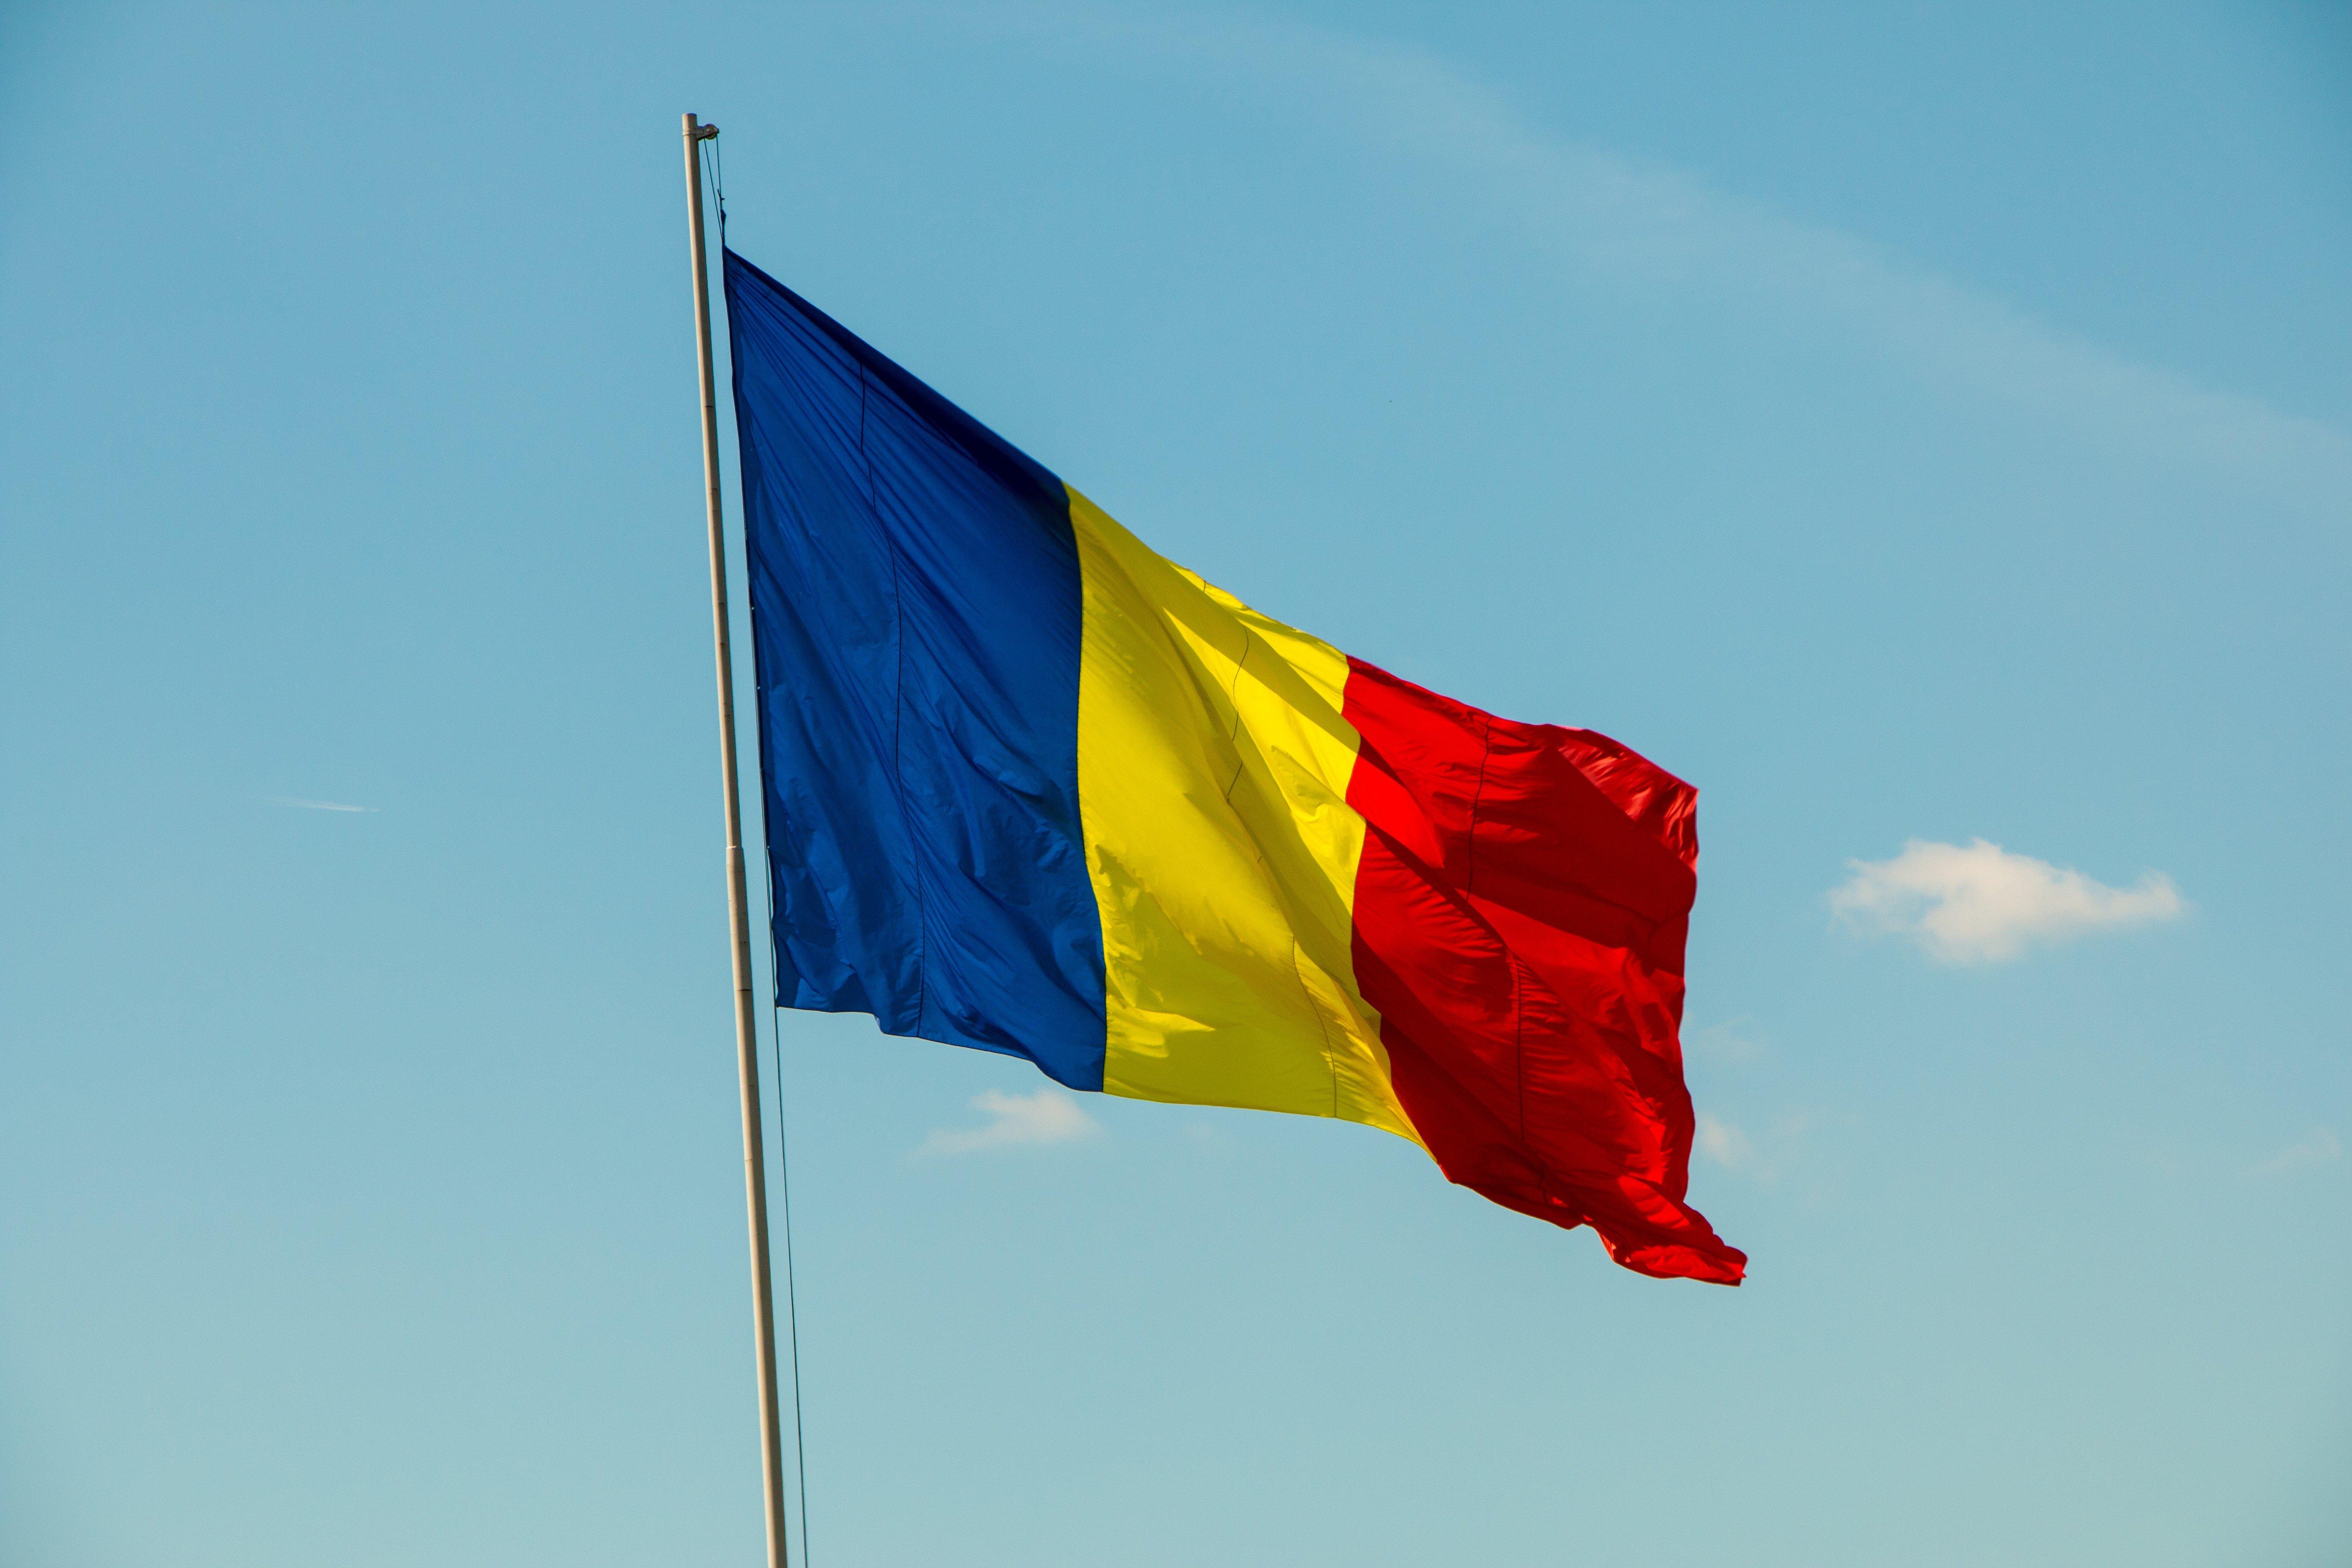 Wallpaper 5472x3648 Px Flag Romania 5472x3648